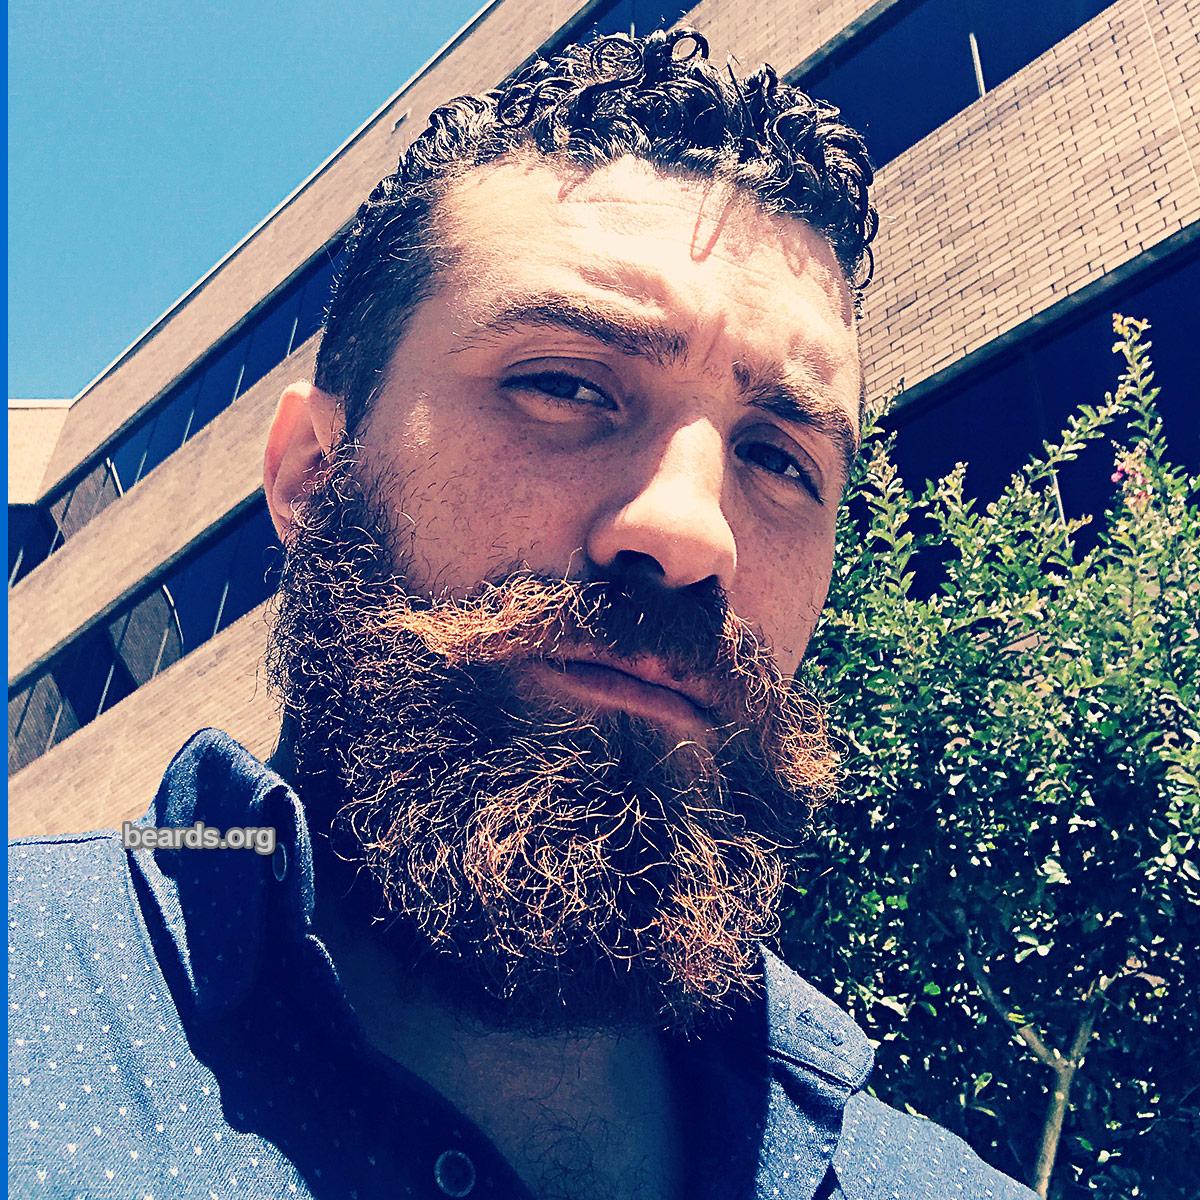 Sam, beard photo 3